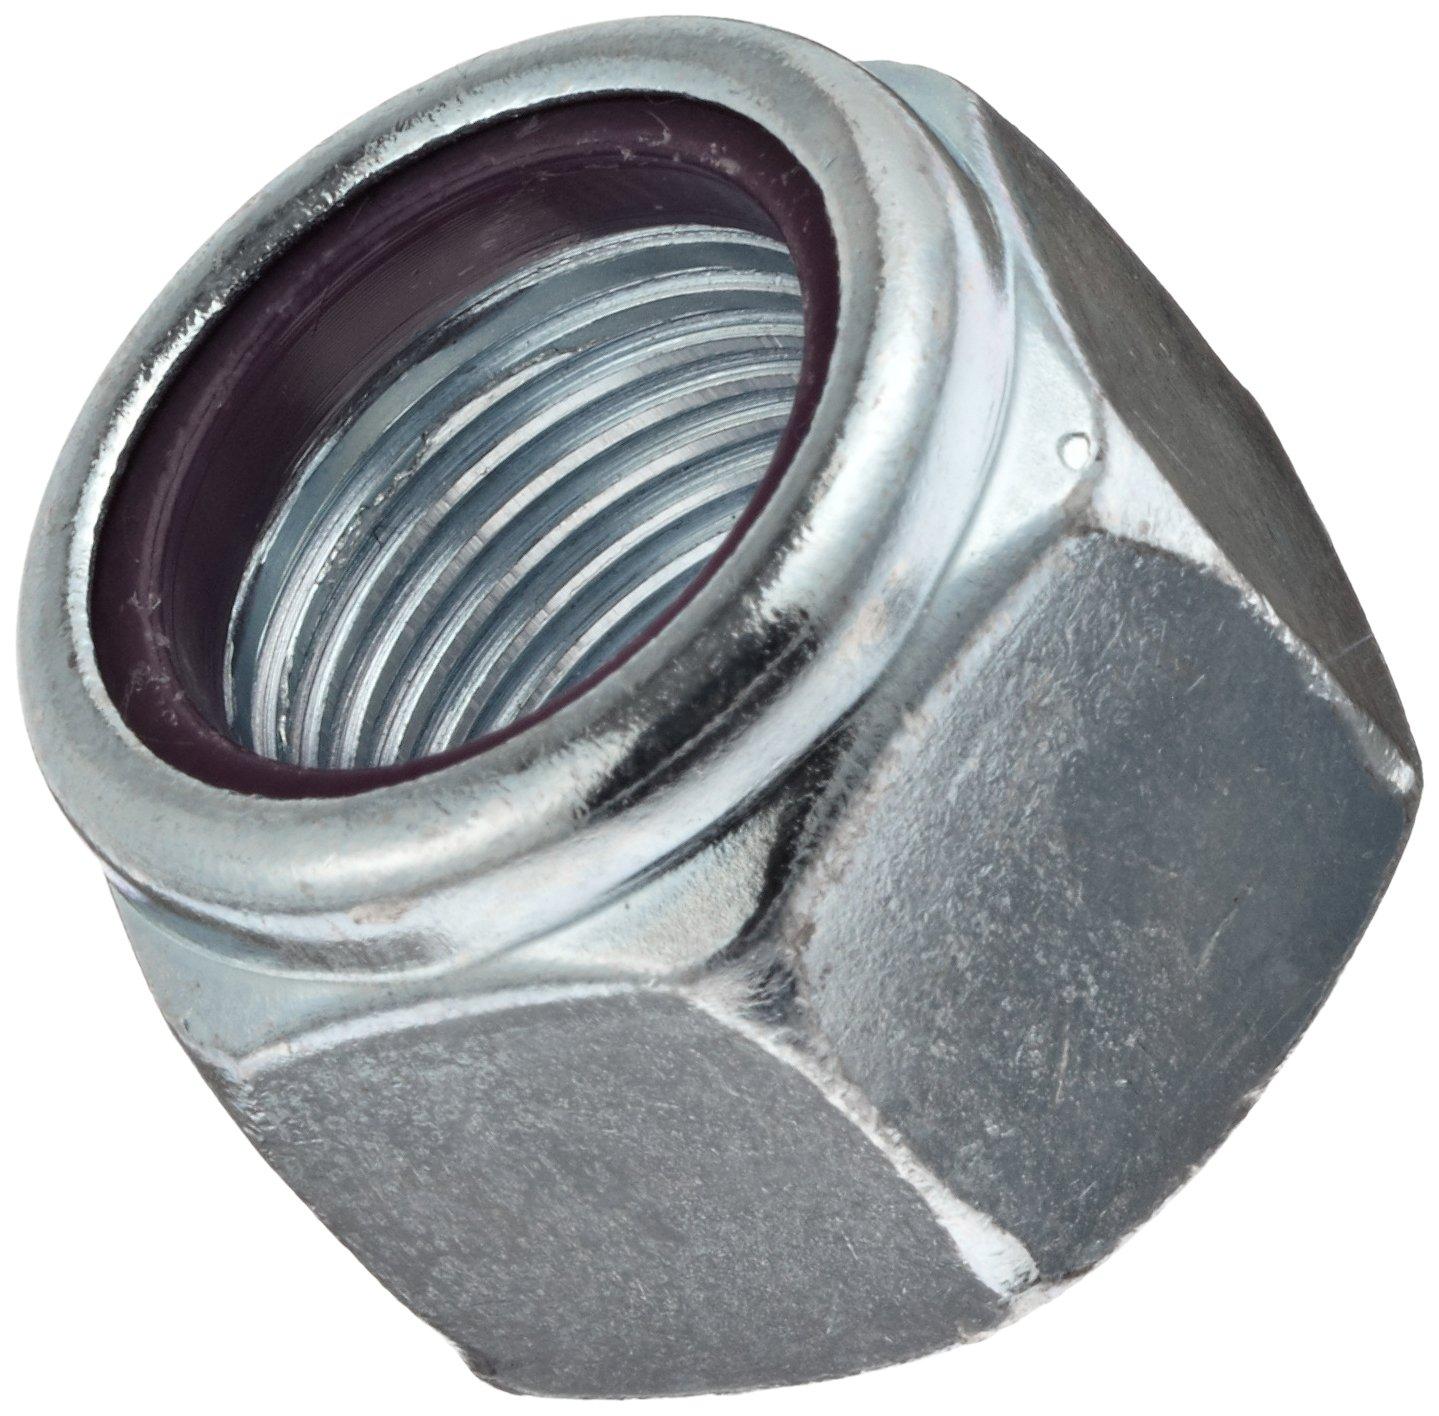 0.552 Width Across Flats 5//16-24 Threads Right Hand Threads Self-Locking Nylon Insert Steel Hex Nut Zinc Plated Finish Grade 2 Pack of 100